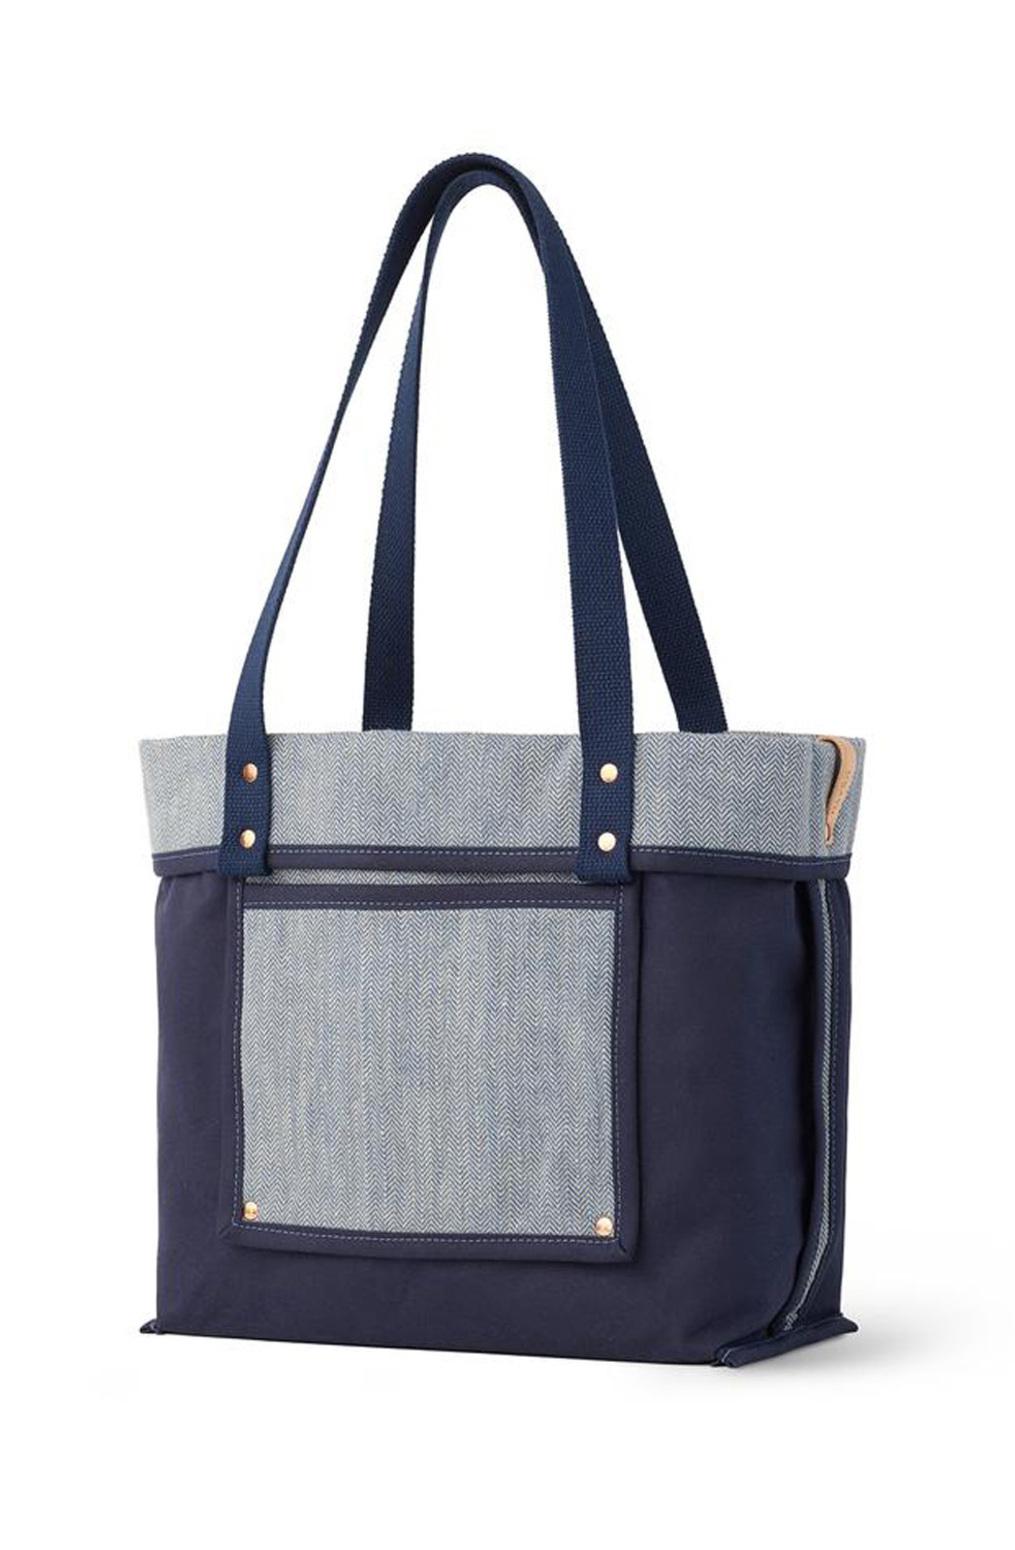 Alabama chanin heath sews reversible linen tote bag